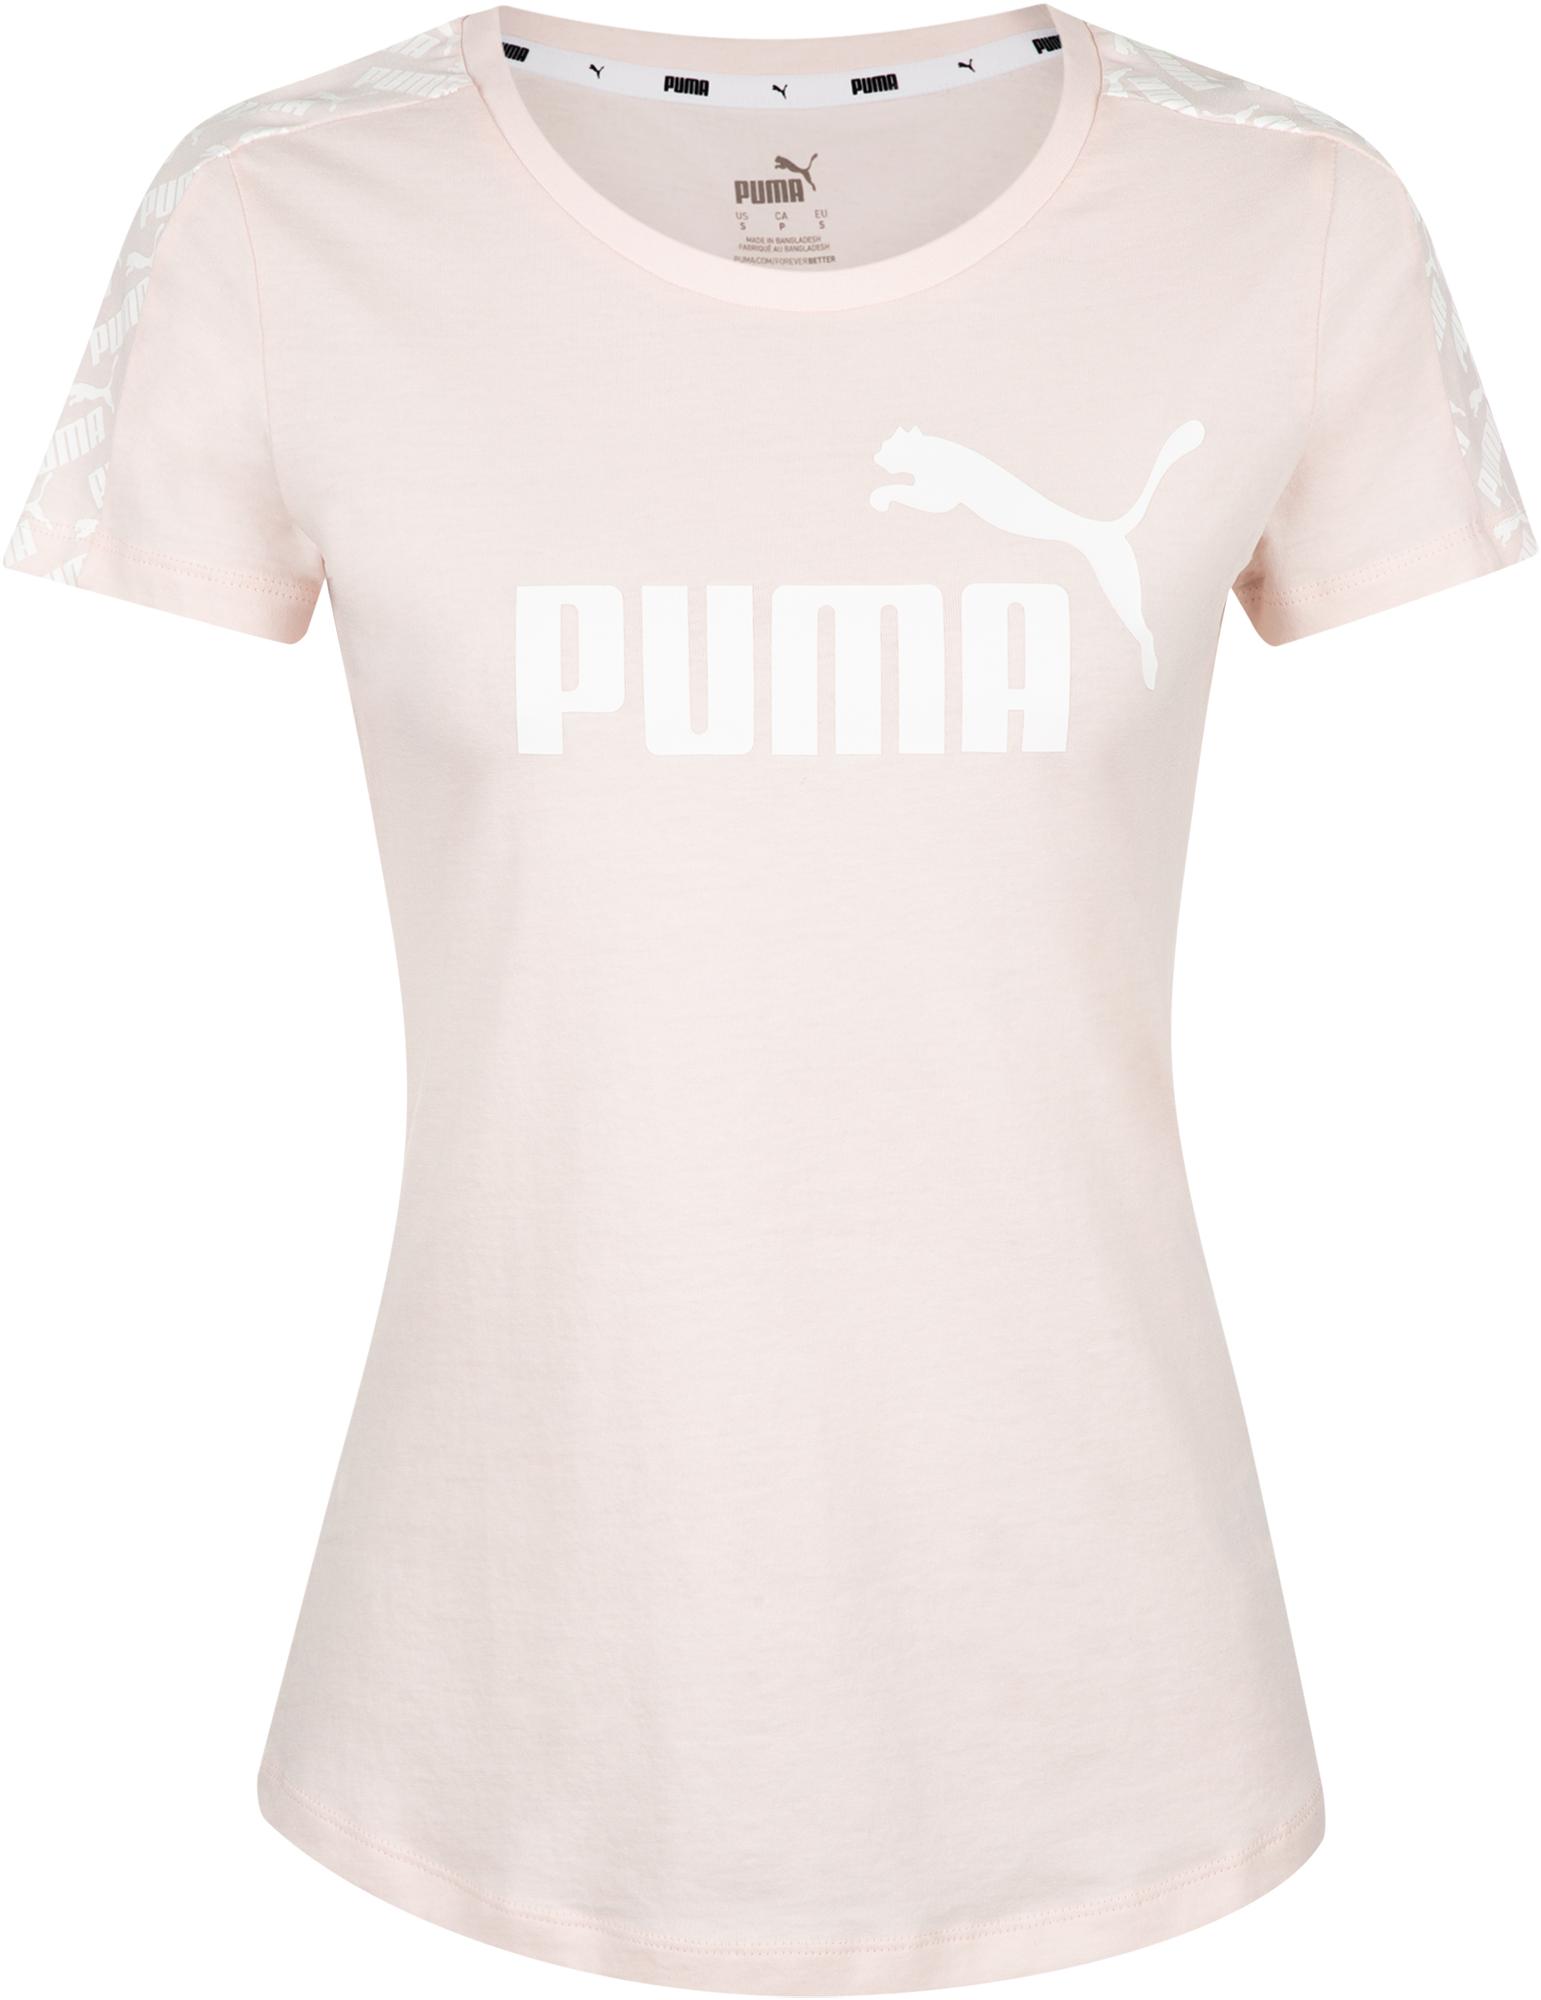 Puma Футболка женская Puma Amplified Tee, размер 44-46 puma худи женская puma amplified cropped размер 42 44